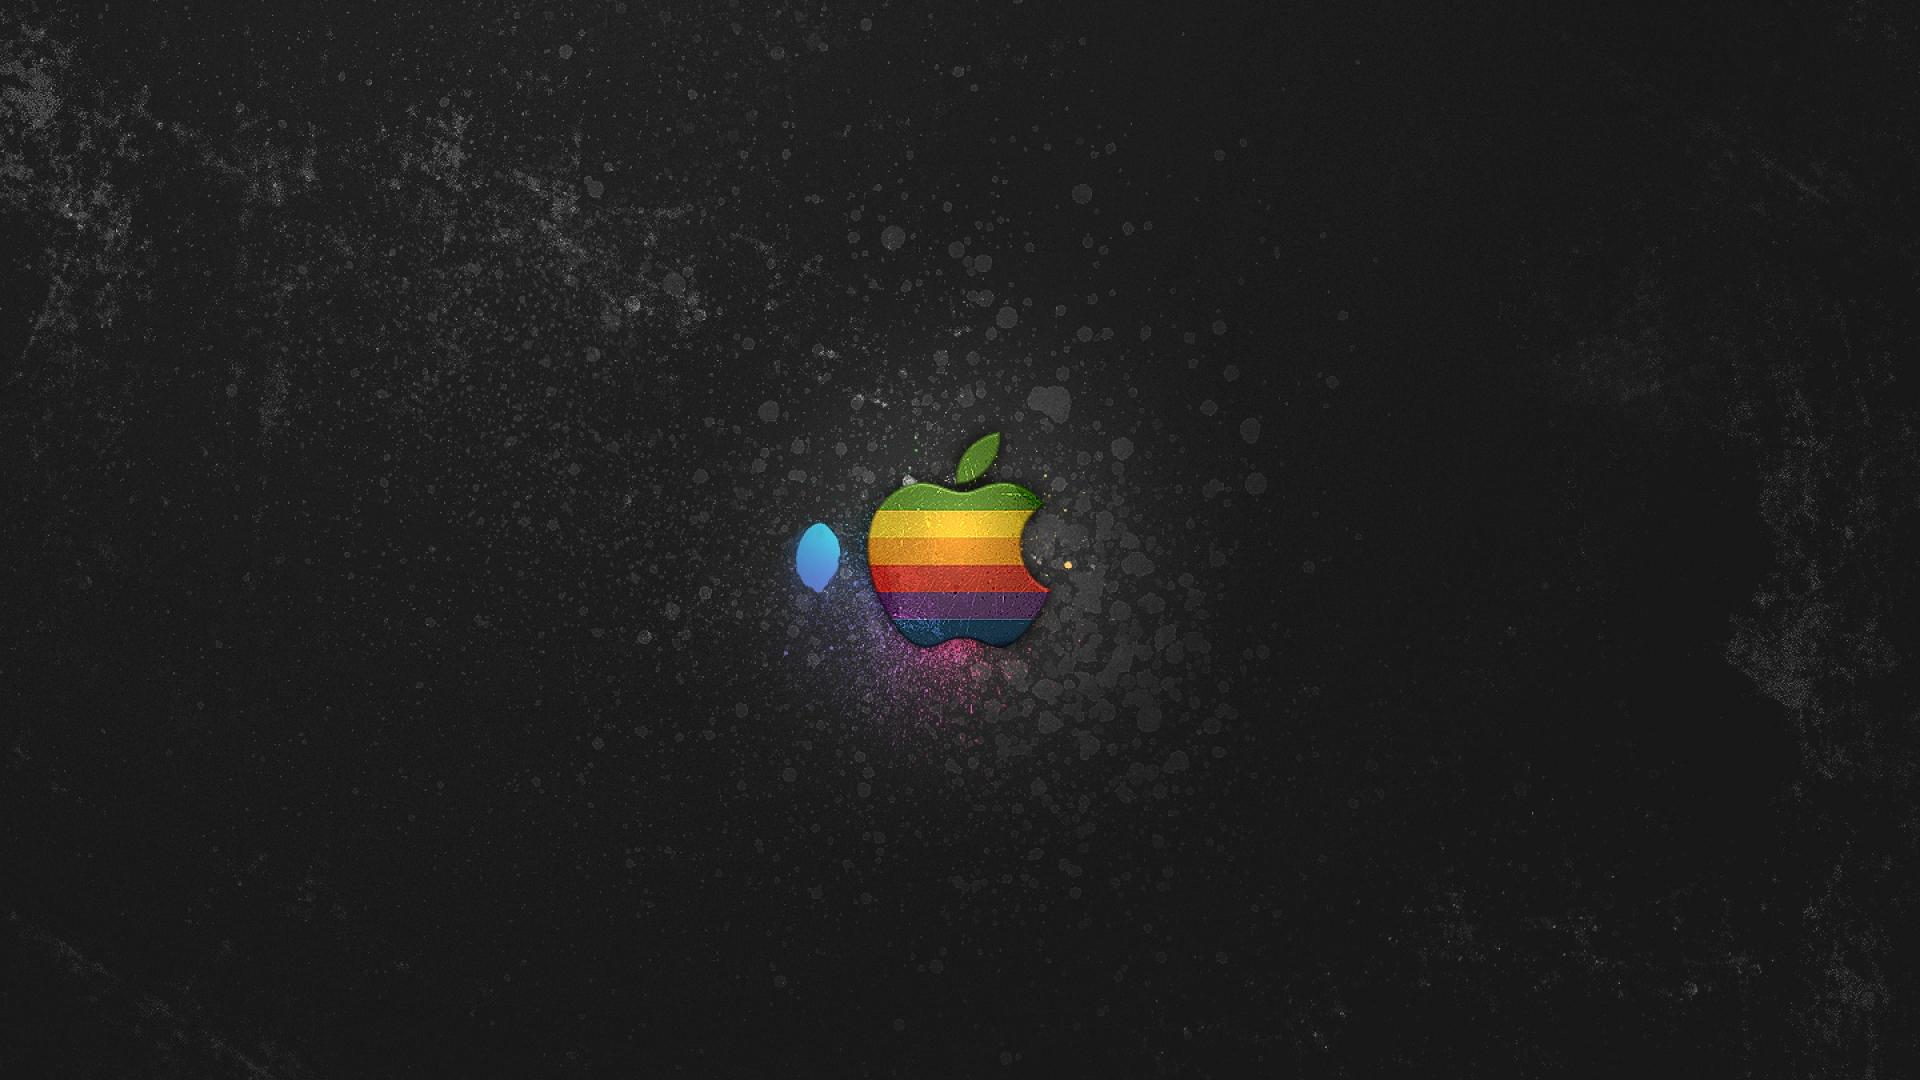 Colorful Apple OS X Wallpaper wallpaper   964405 1920x1080